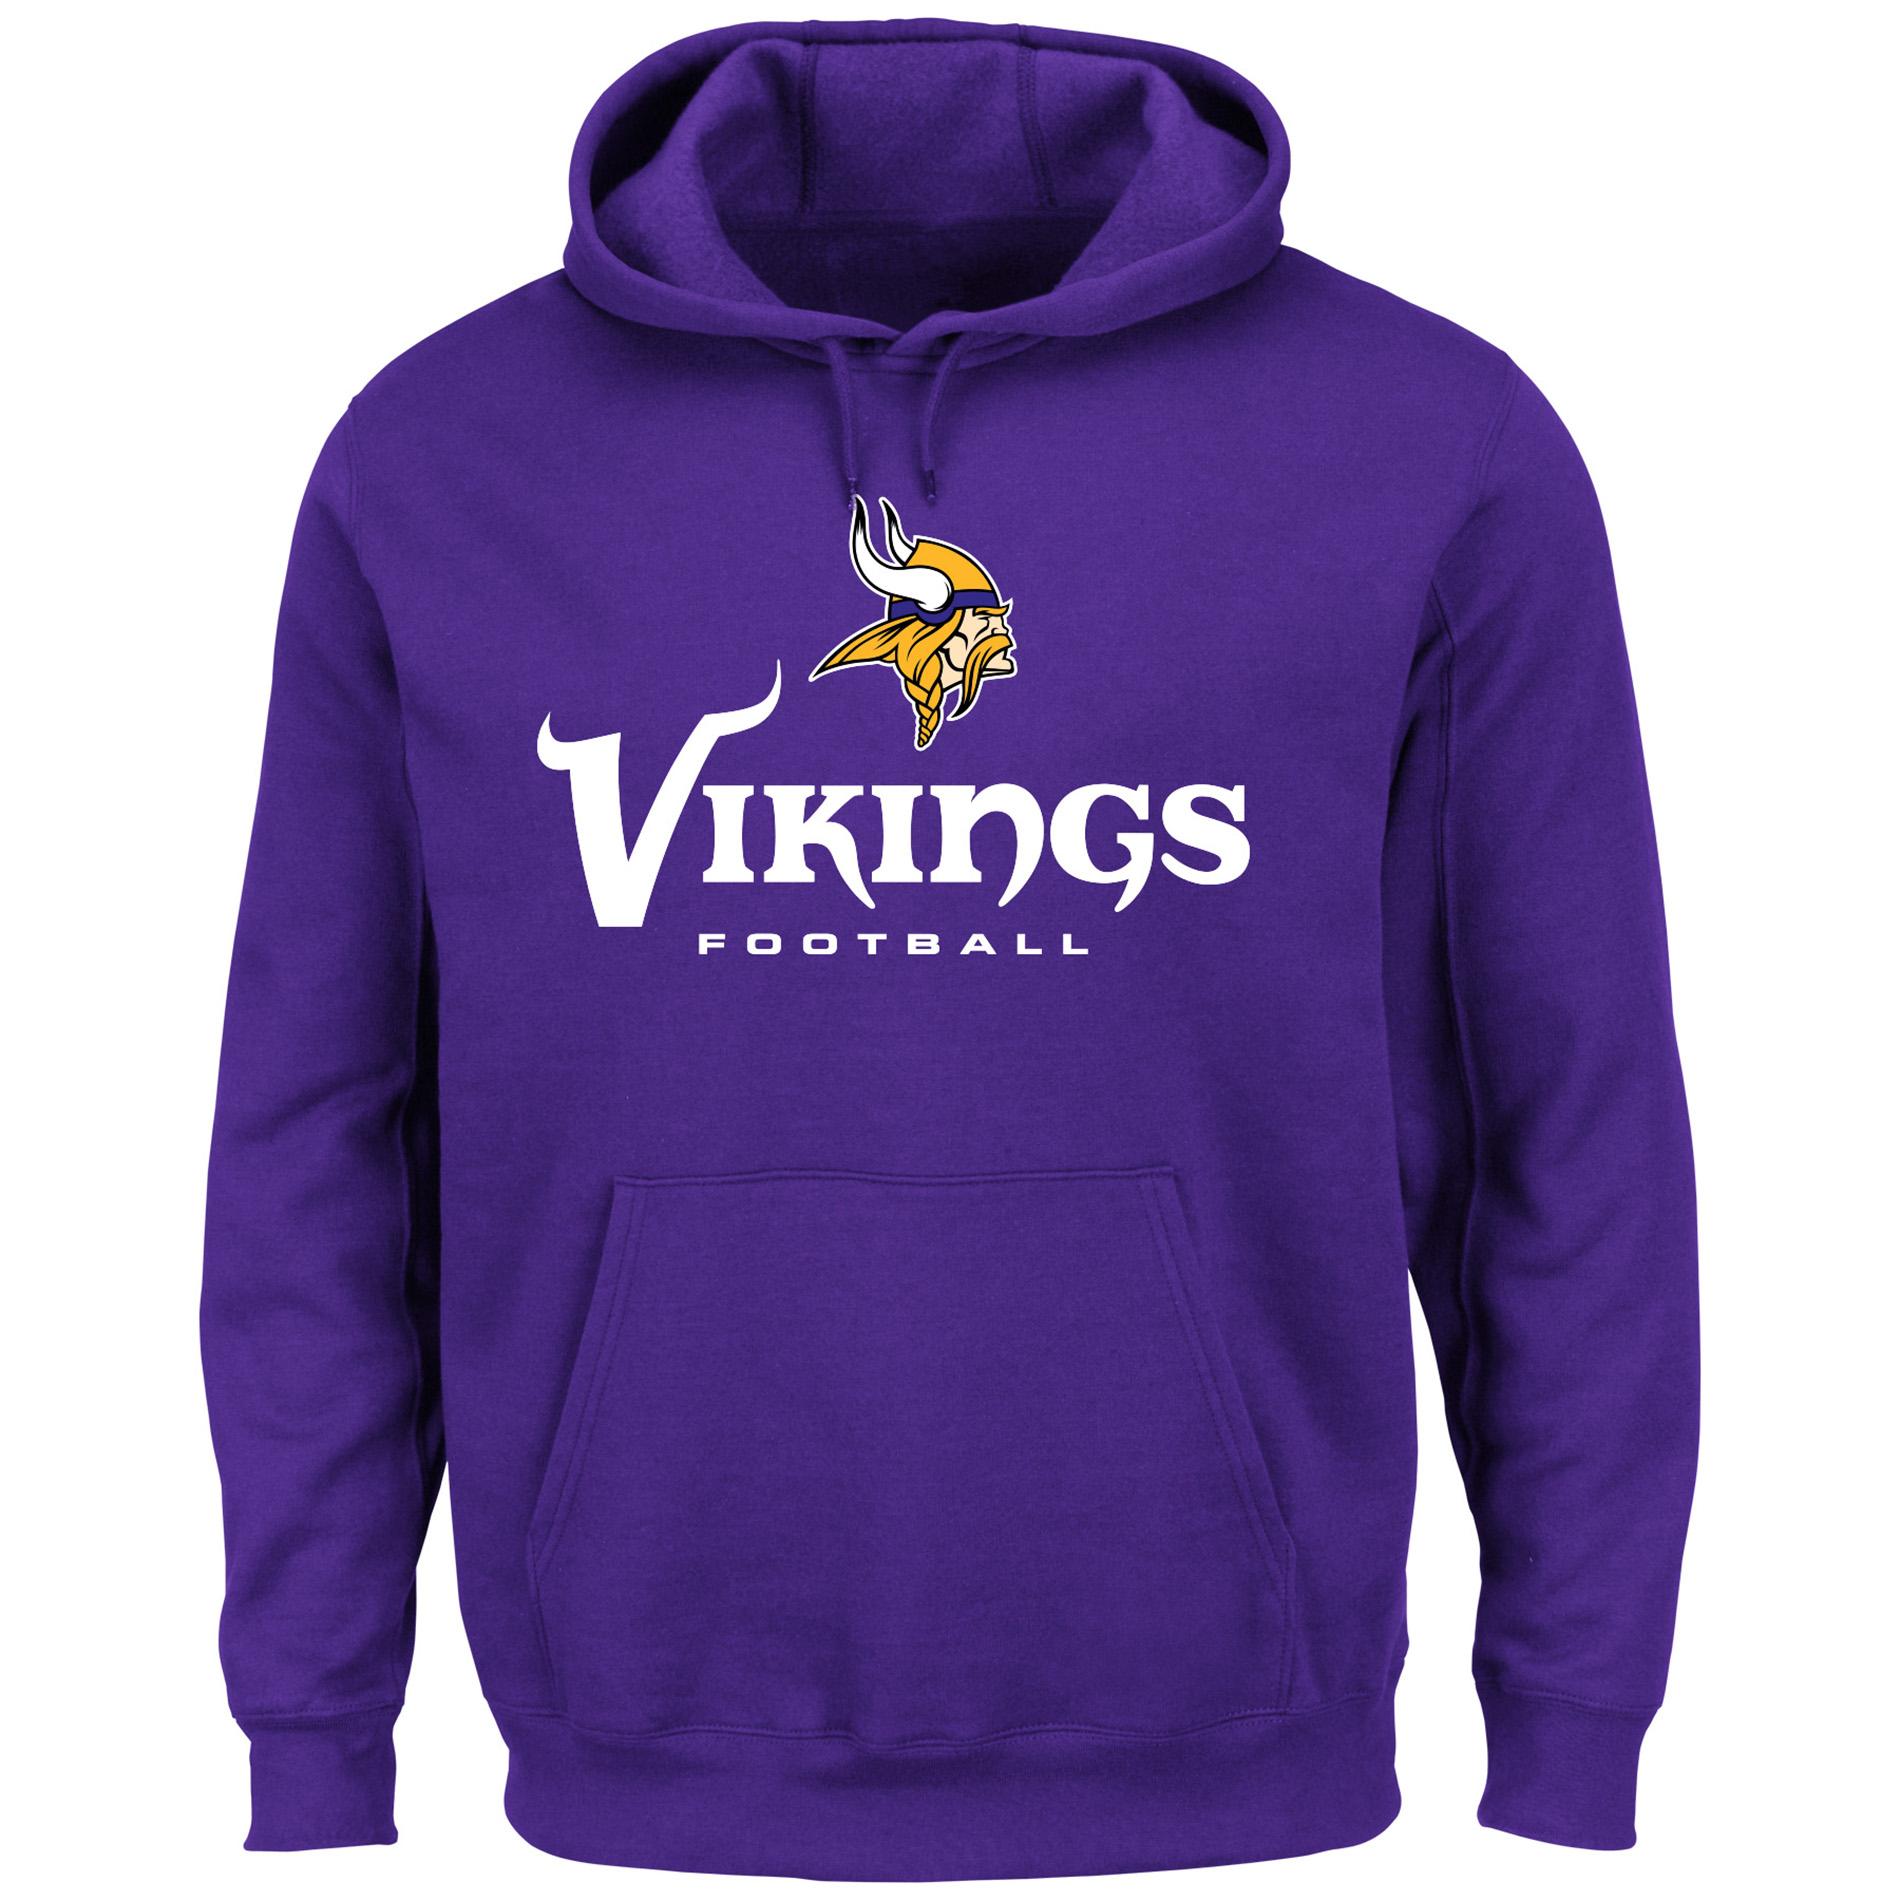 Nfl Mena S Logo Hoodie Minnesota Vikings Hoodies Minnesota Vikings Kick Return